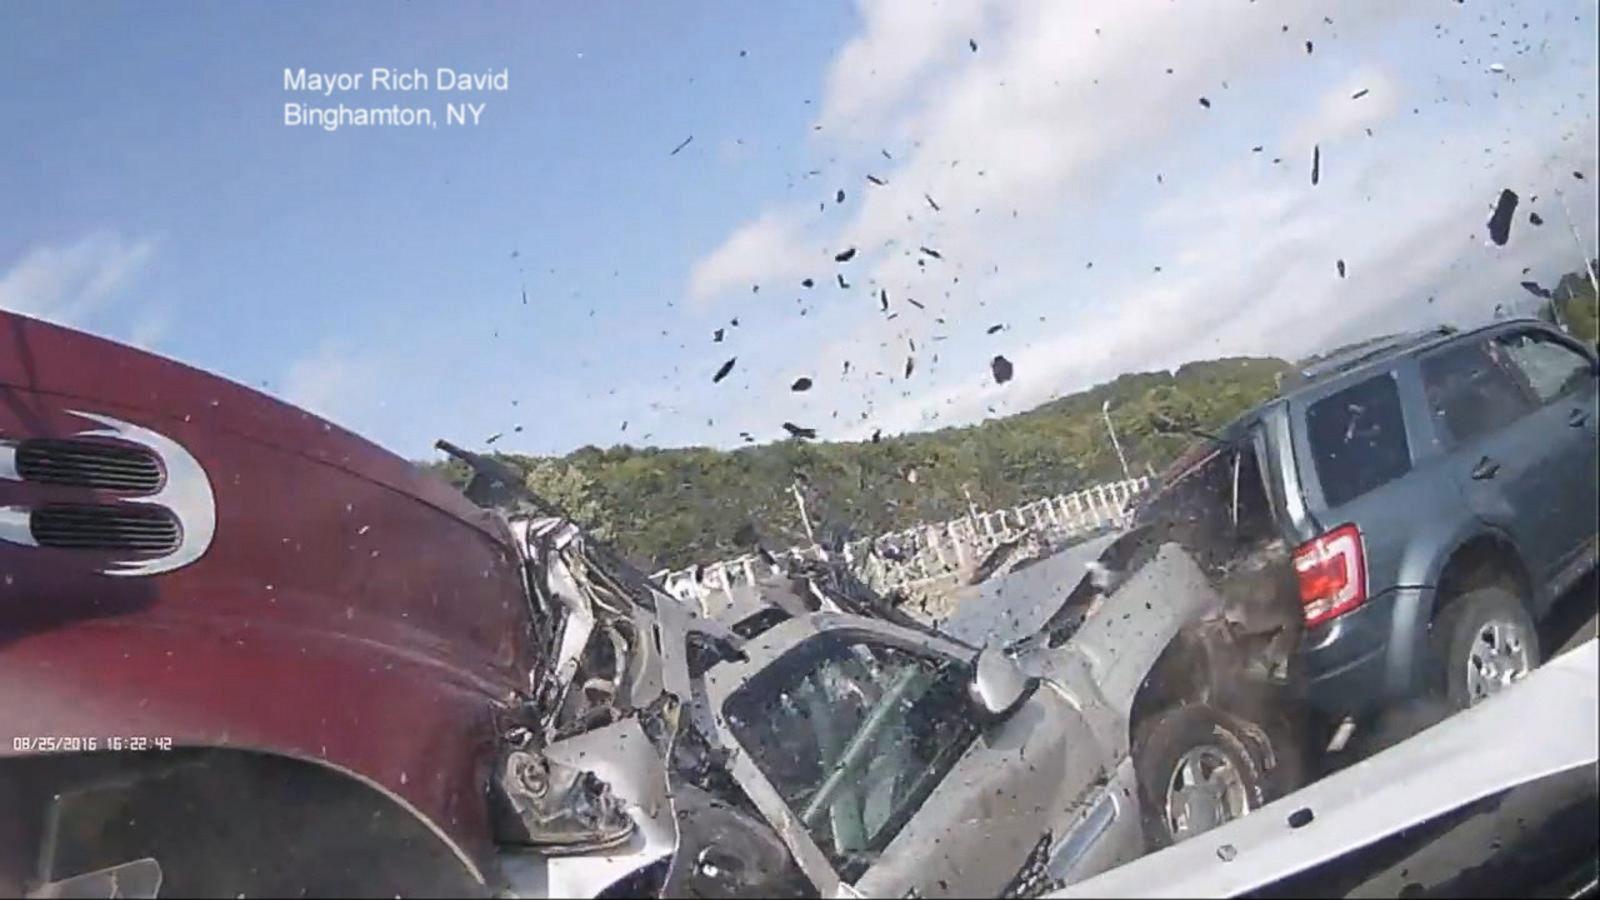 VIDEO: Dashcam Video Shows Massive Car Pileup, Dramatic Rescue